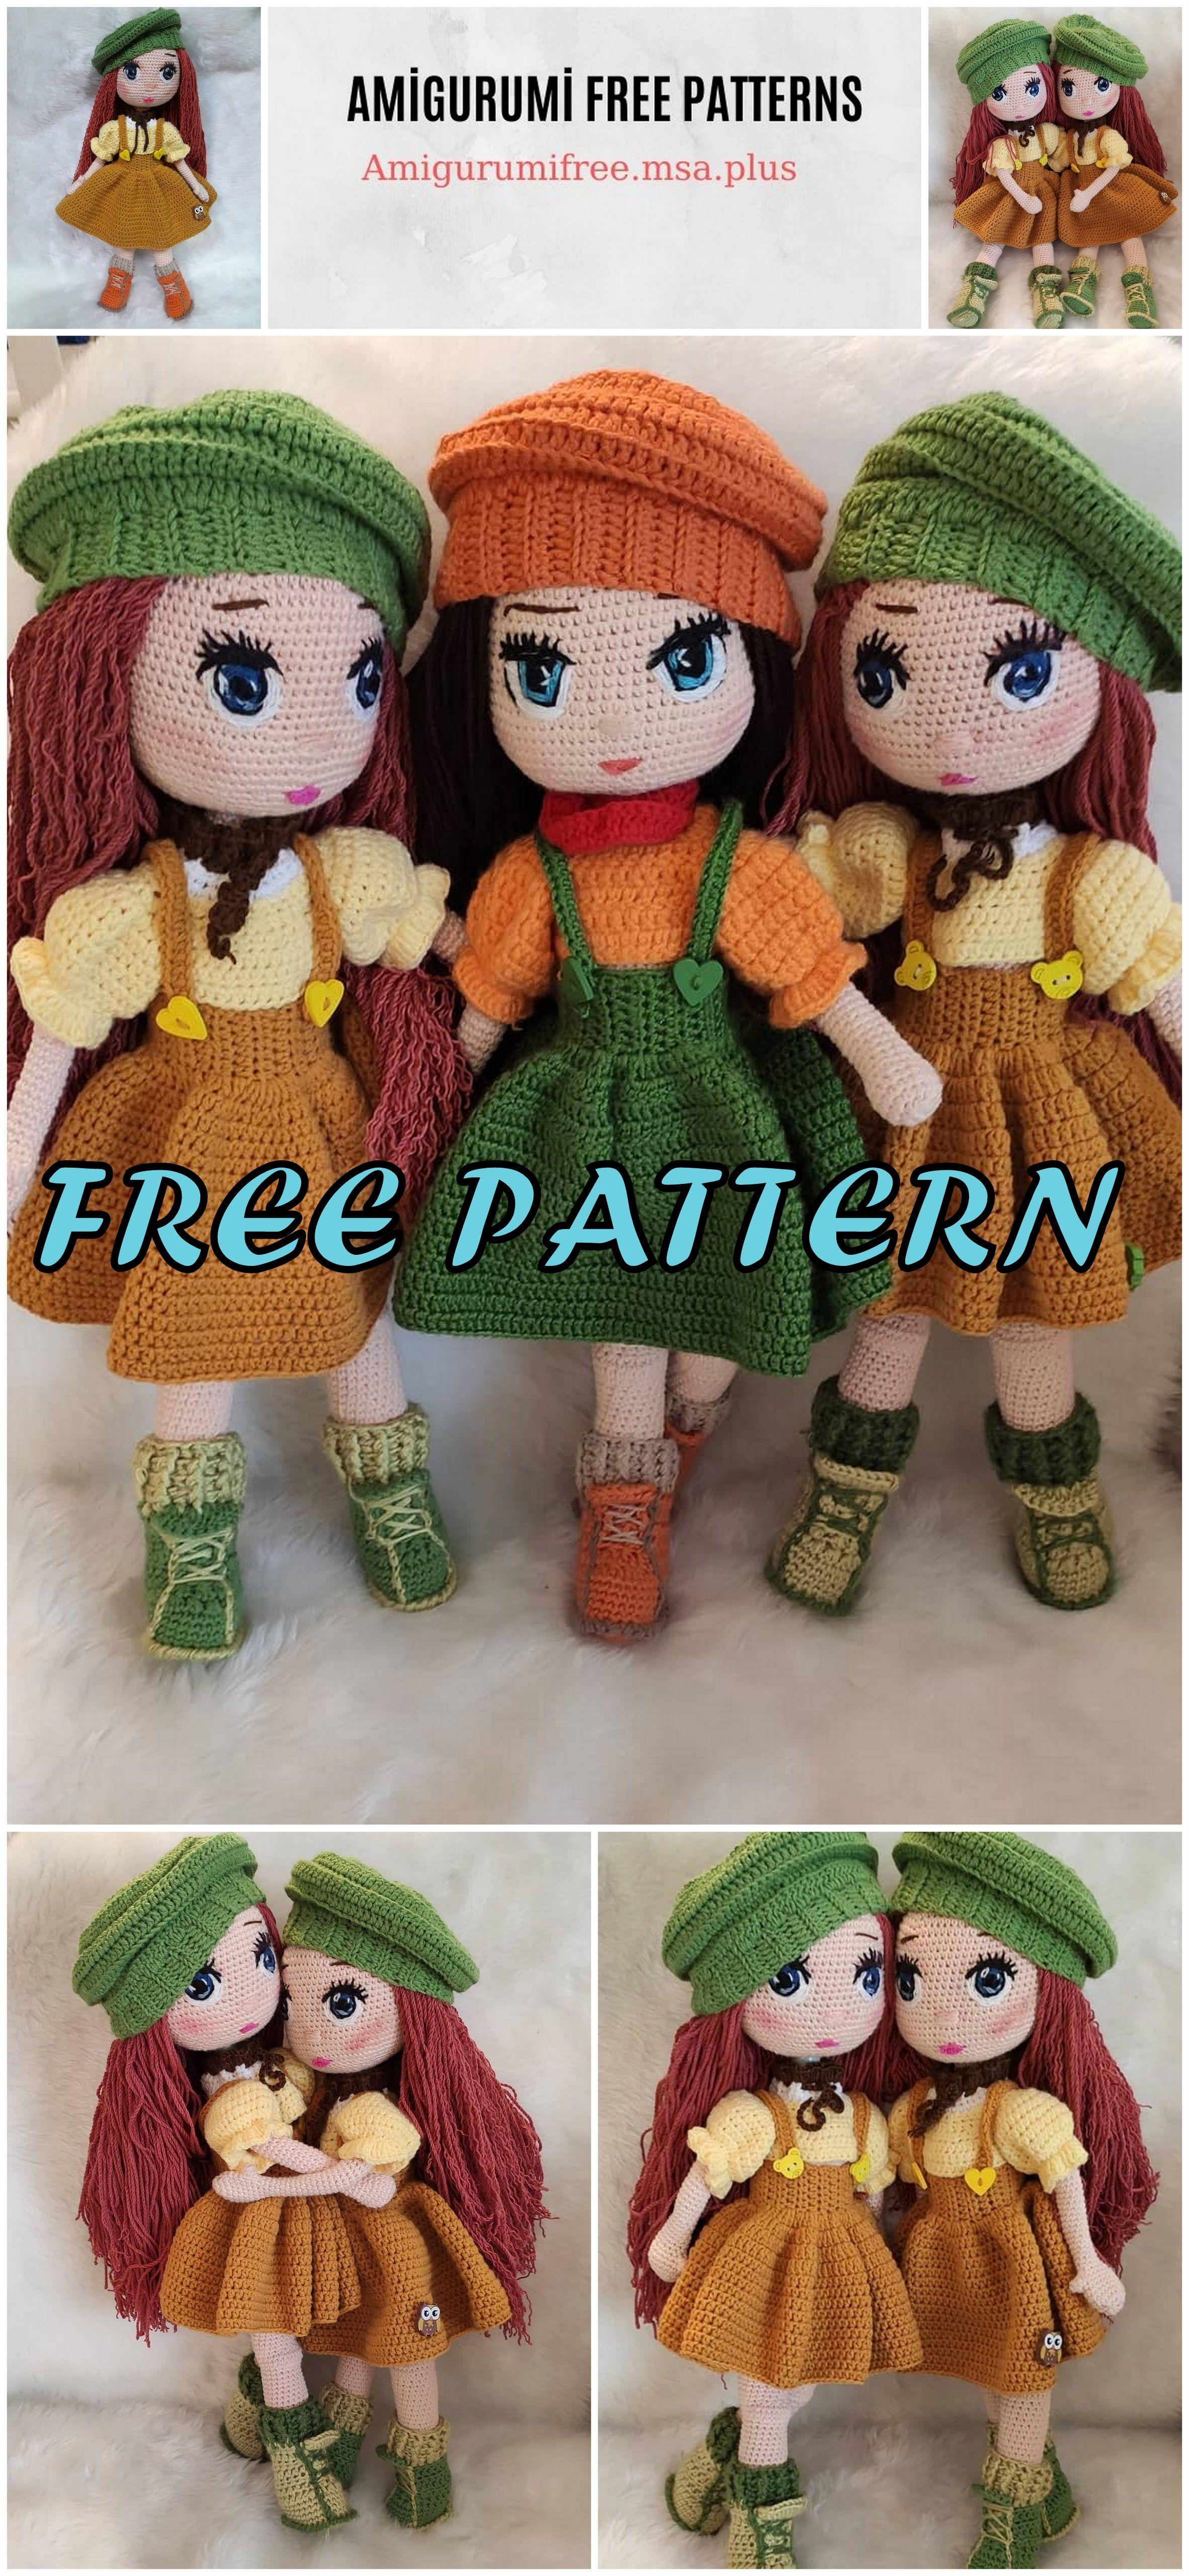 Amigurumi Fairy Tale Doll Free Crochet Pattern #toydoll